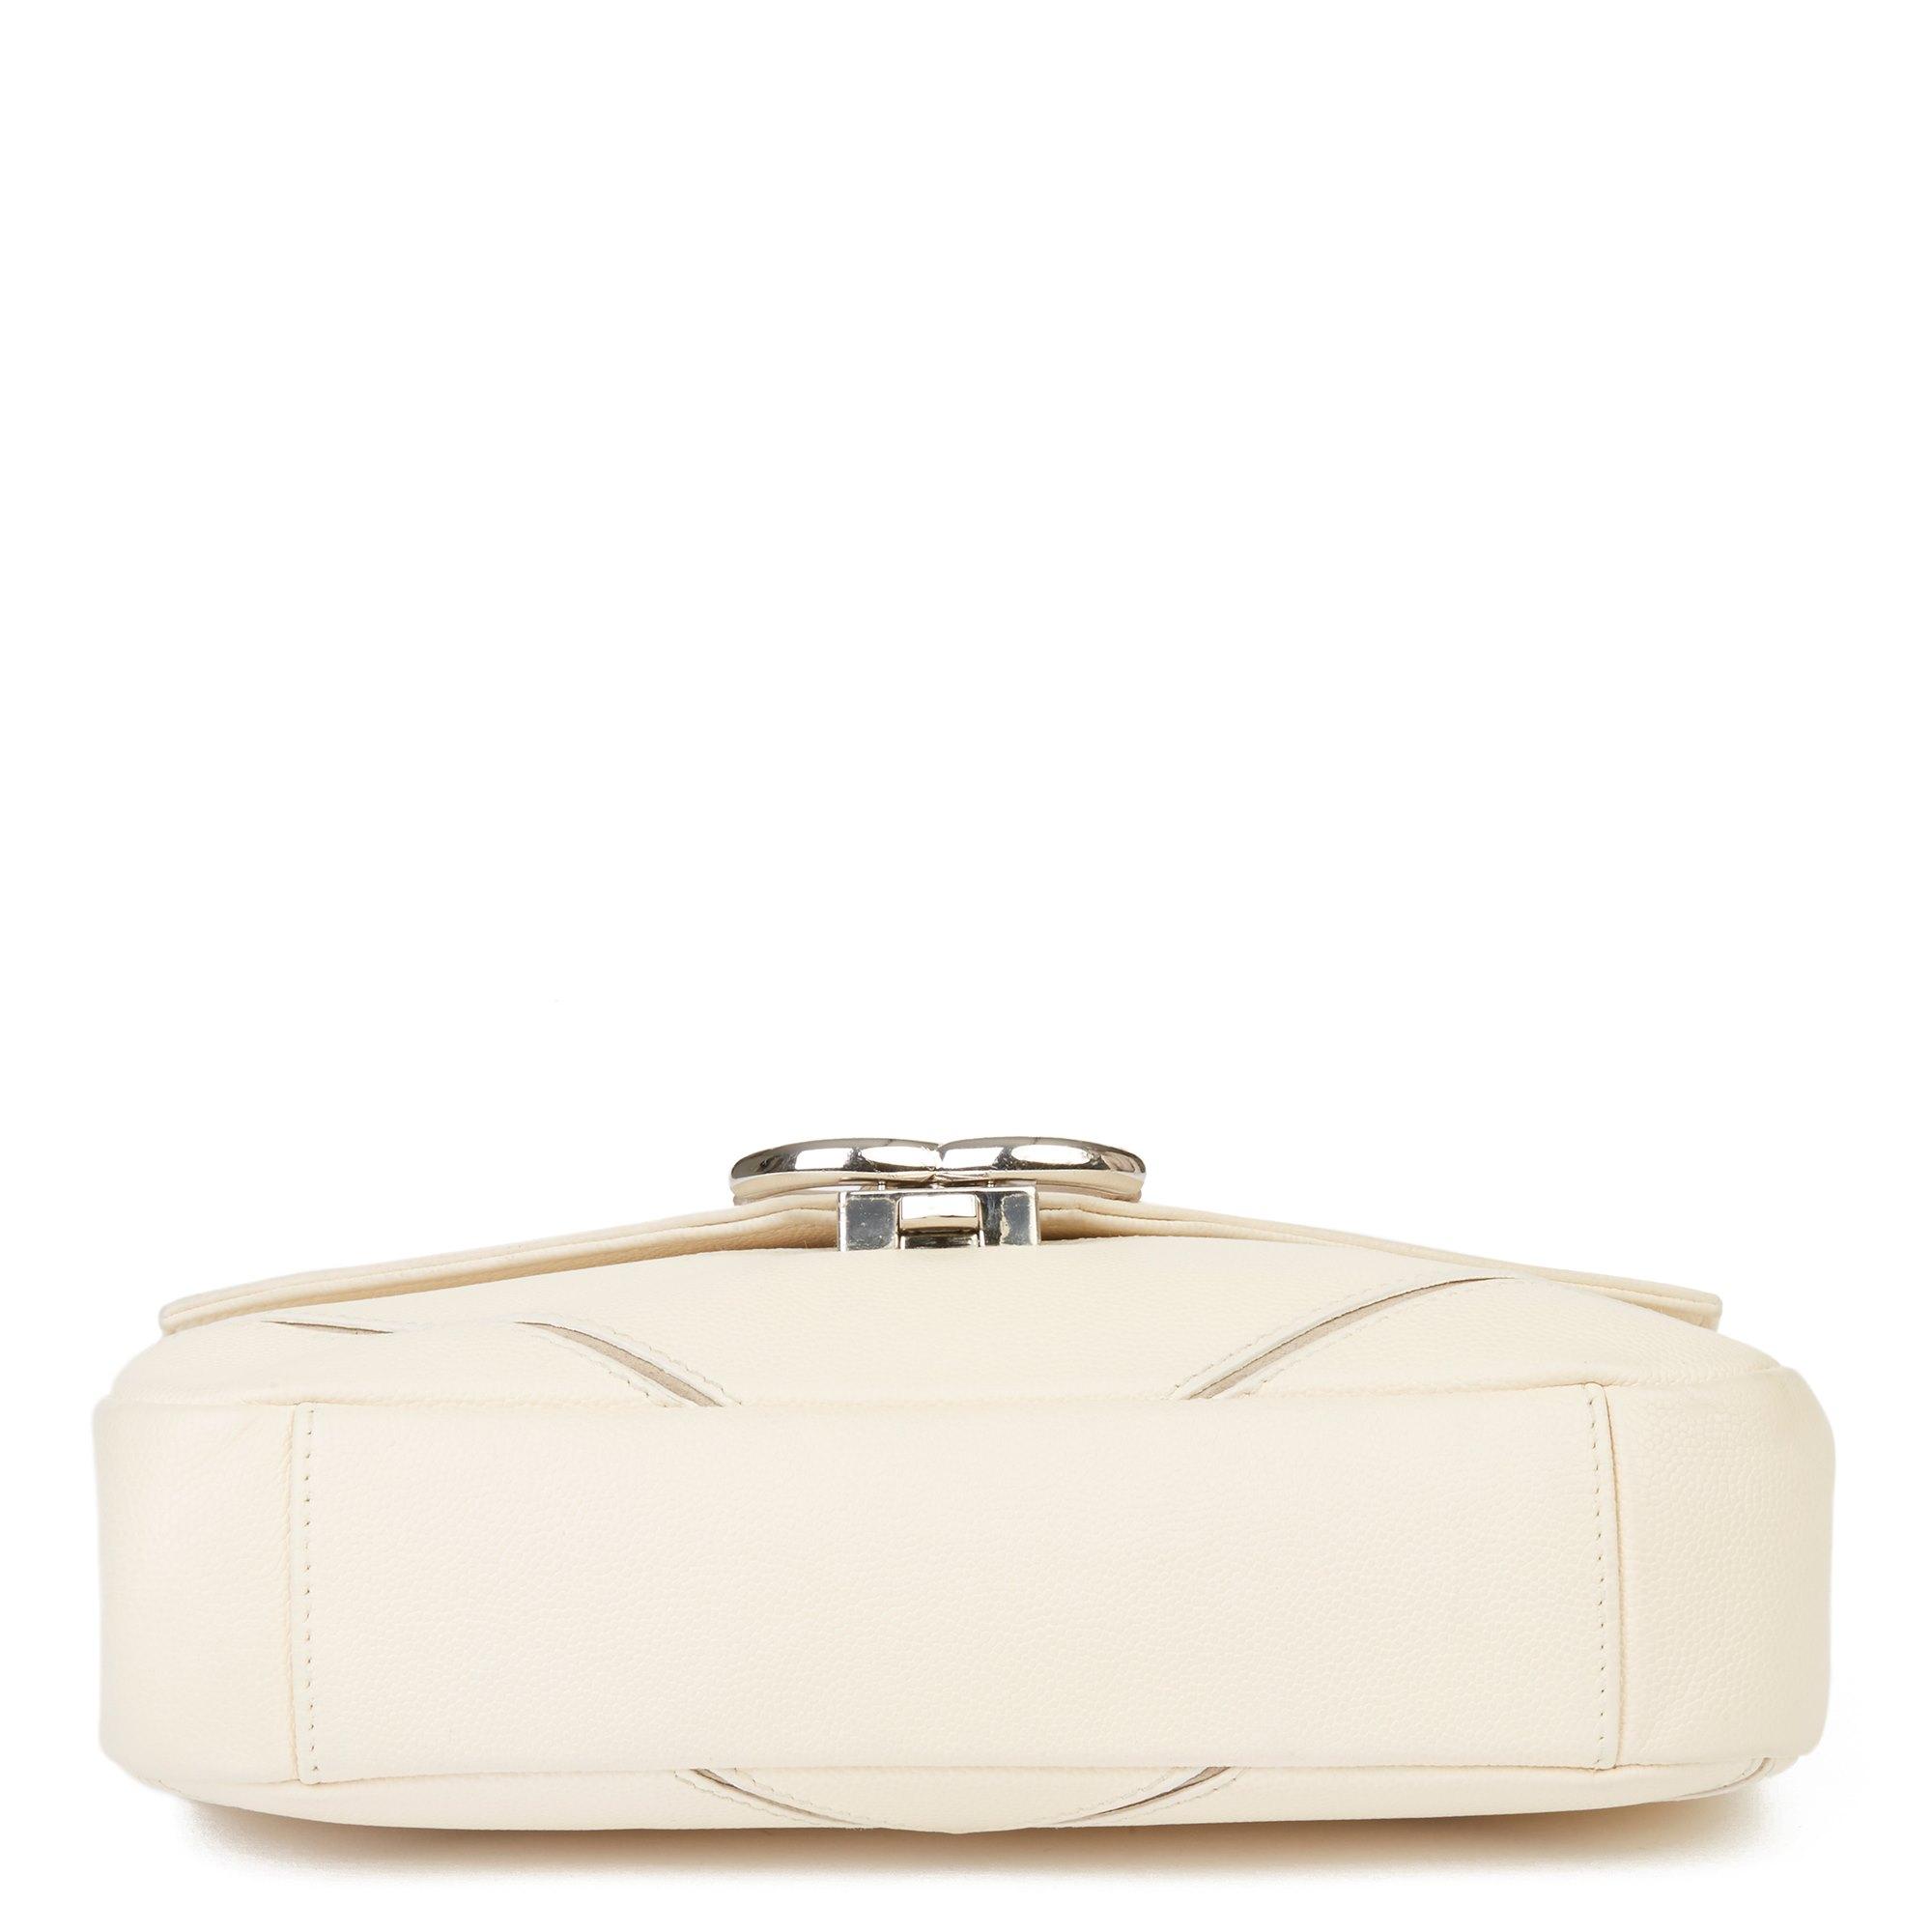 Chanel Cream & Taupe Caviar Leather Chevron CC Flap Bag